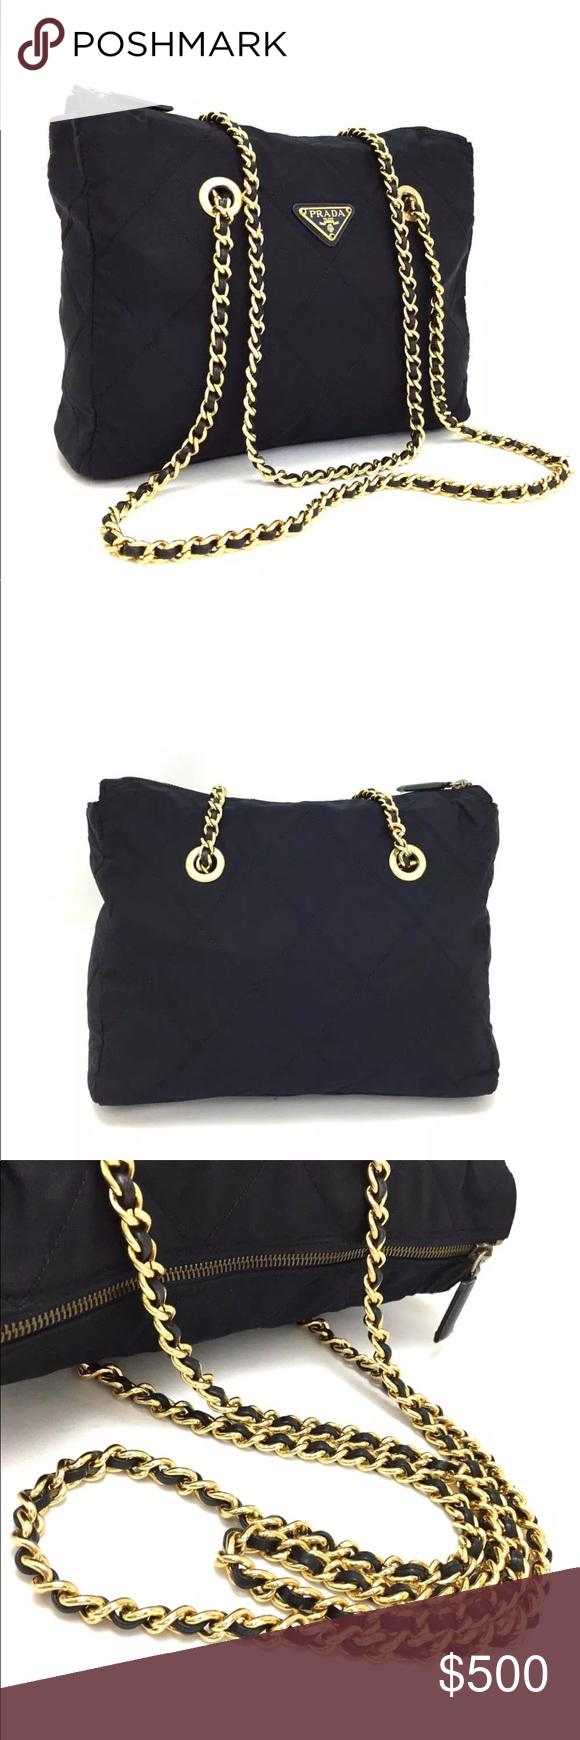 9637157a983b Prada logos quilted matelasse navy shoulder bag □Serial Number / Date Code  : n/